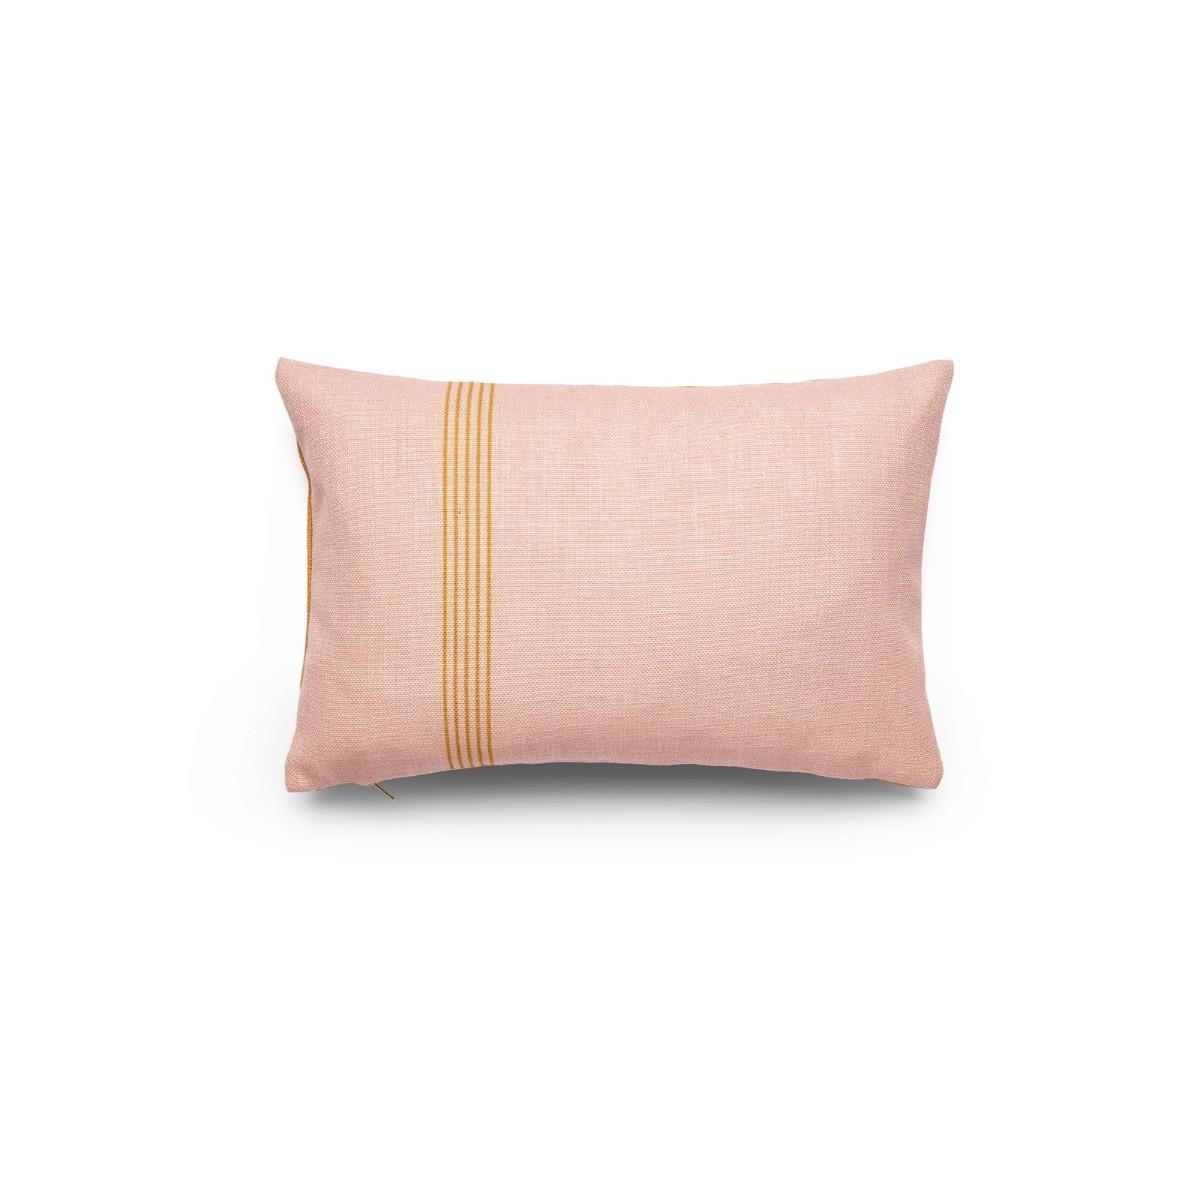 Fest I Honey Cushion (M. ENGELGEER) 45x30cm